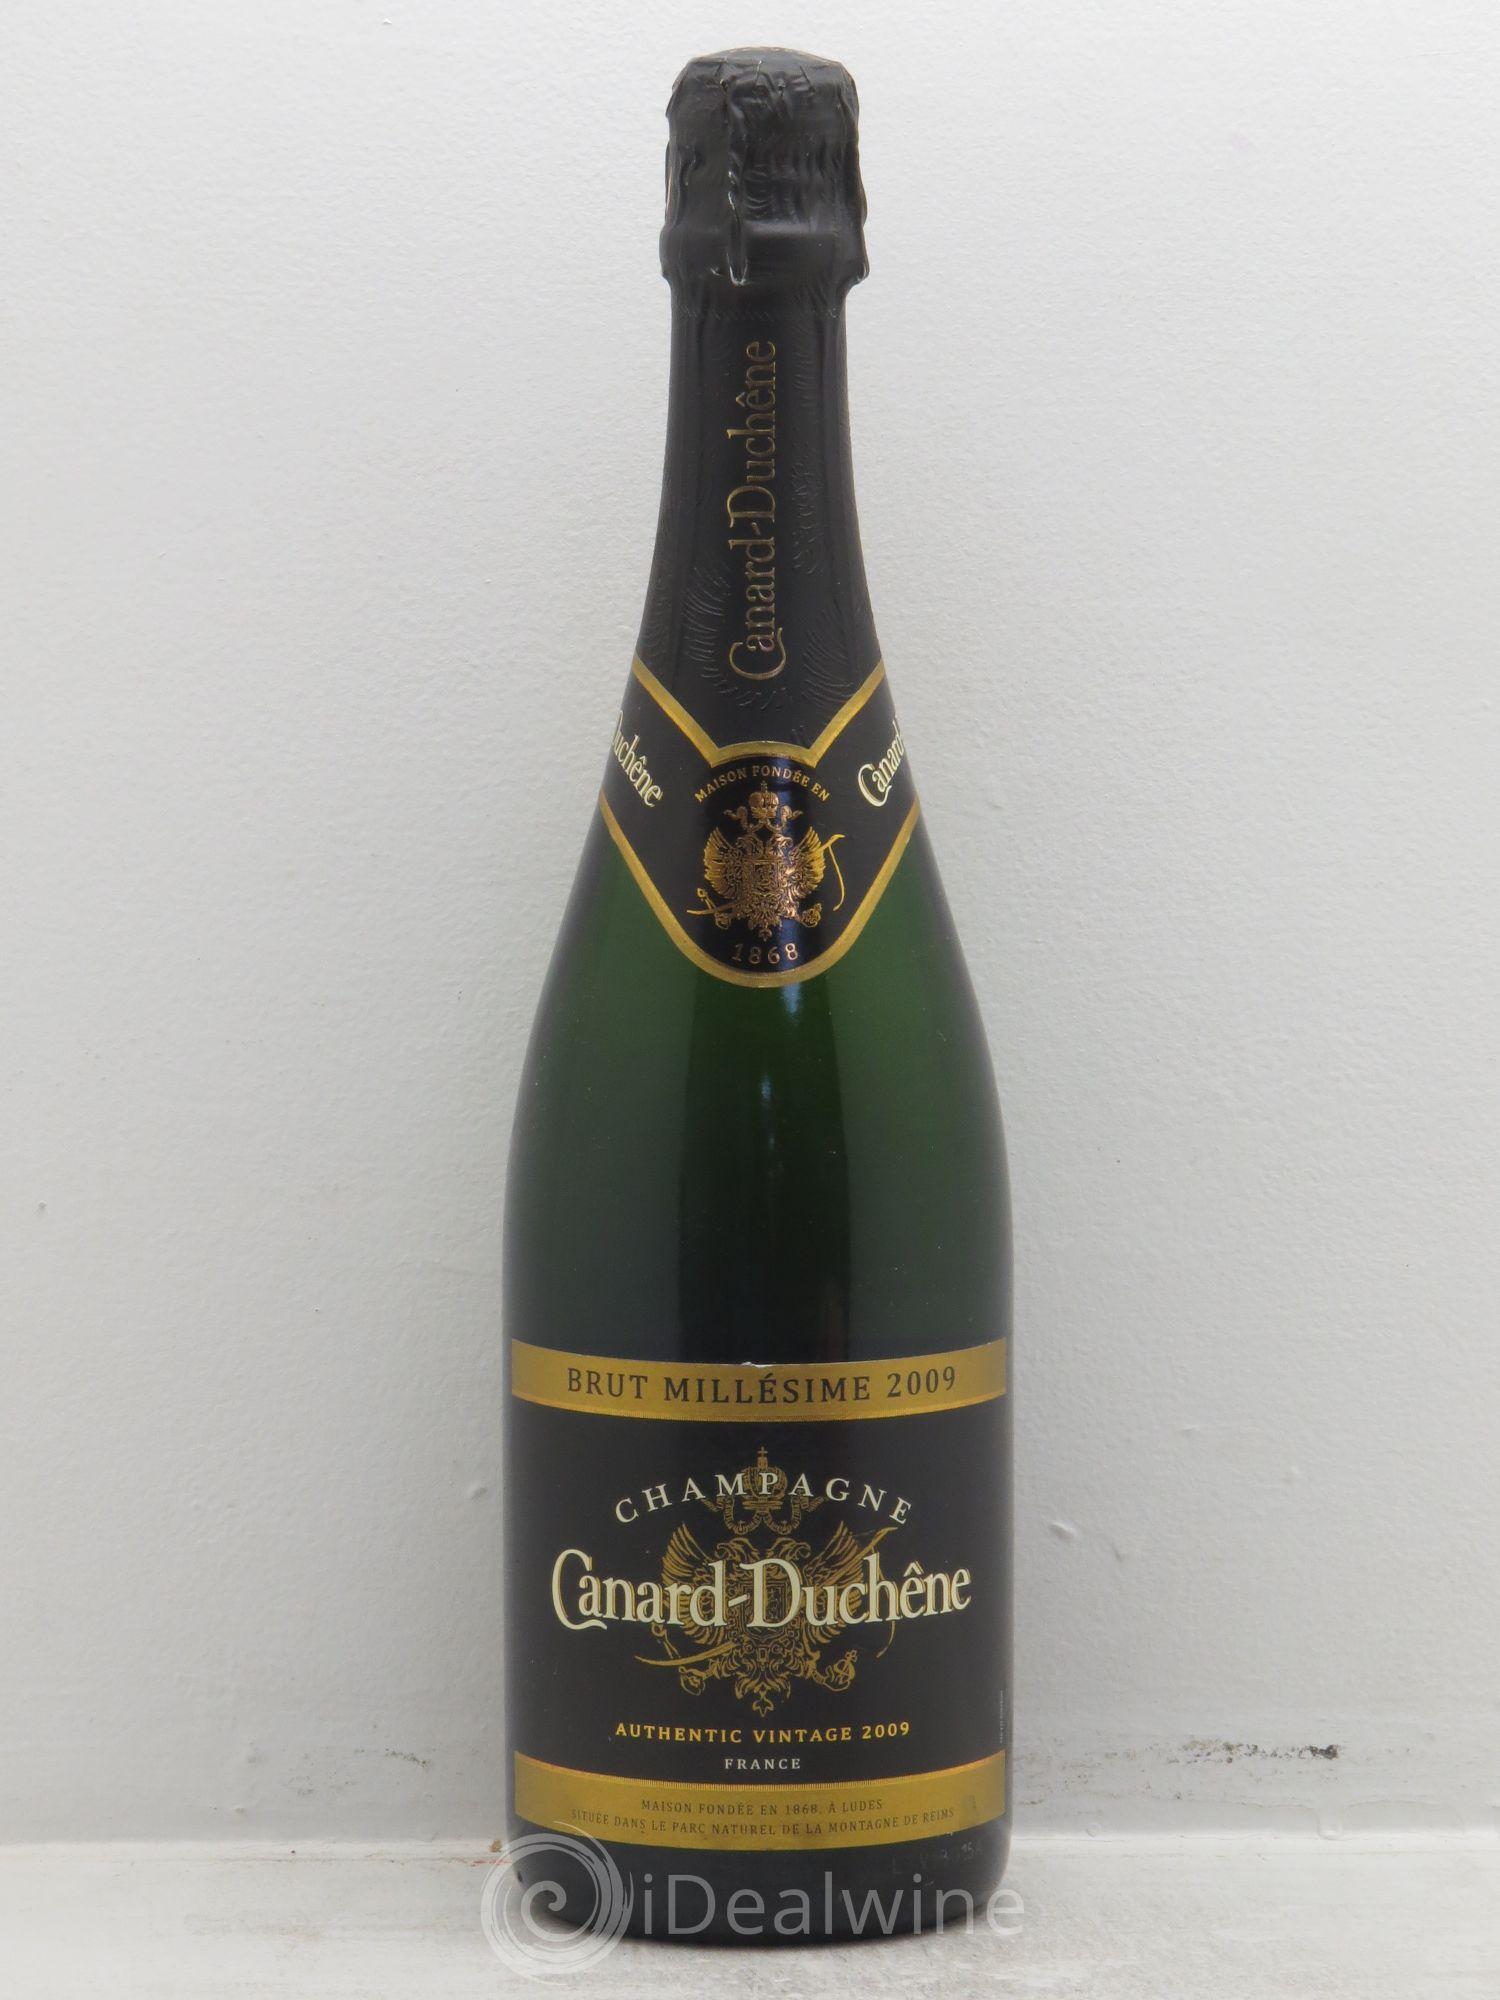 acheter brut champagne canard duch ne sans prix de r serve 2009 lot 1546. Black Bedroom Furniture Sets. Home Design Ideas